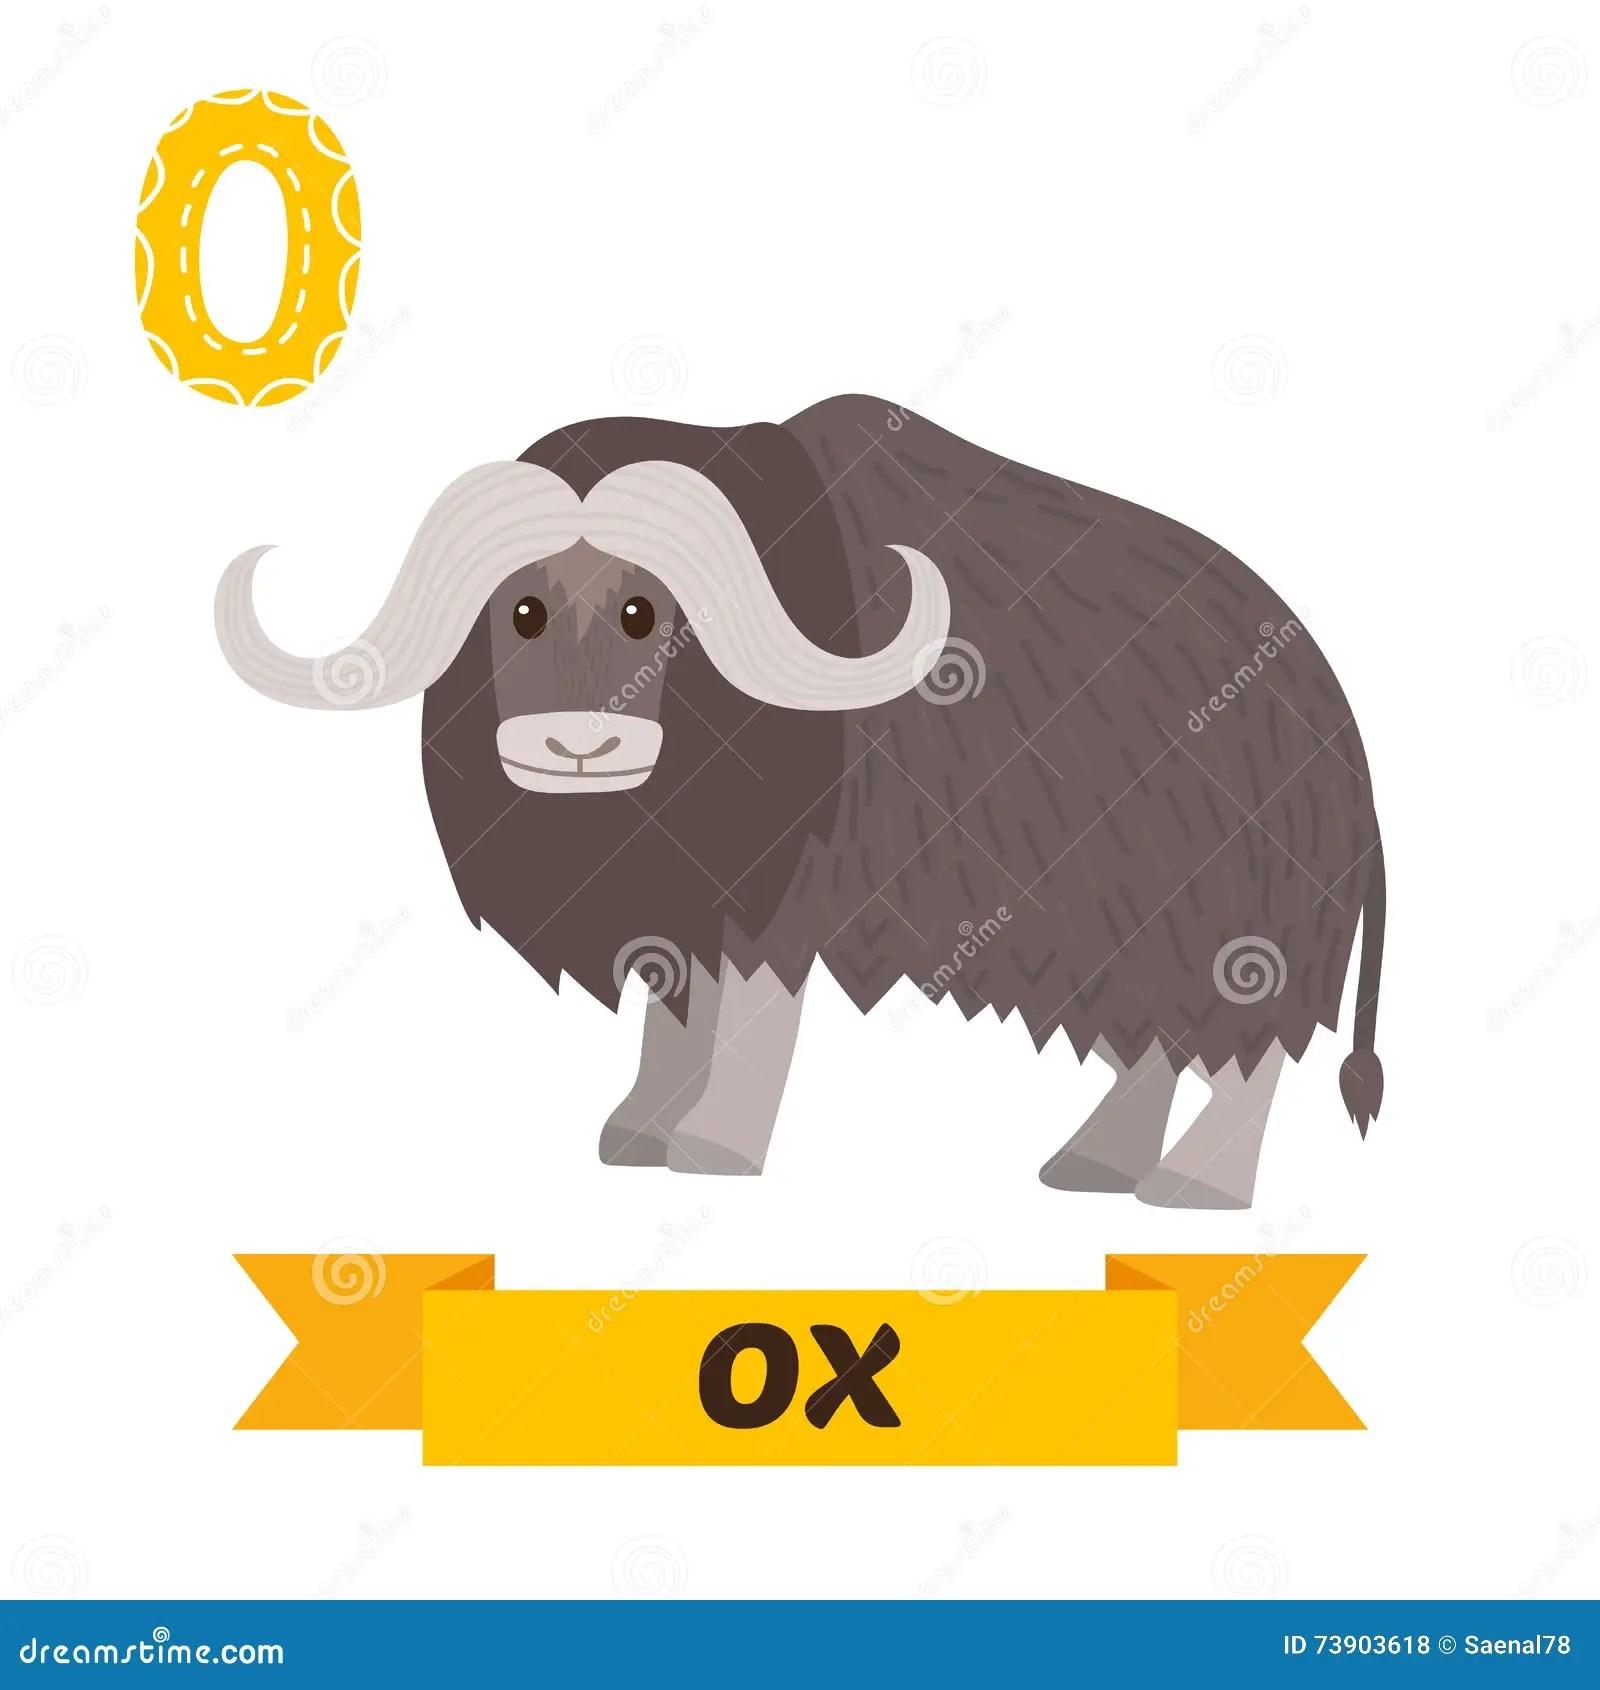 Ox O Letter Cute Children Animal Alphabet In Vector